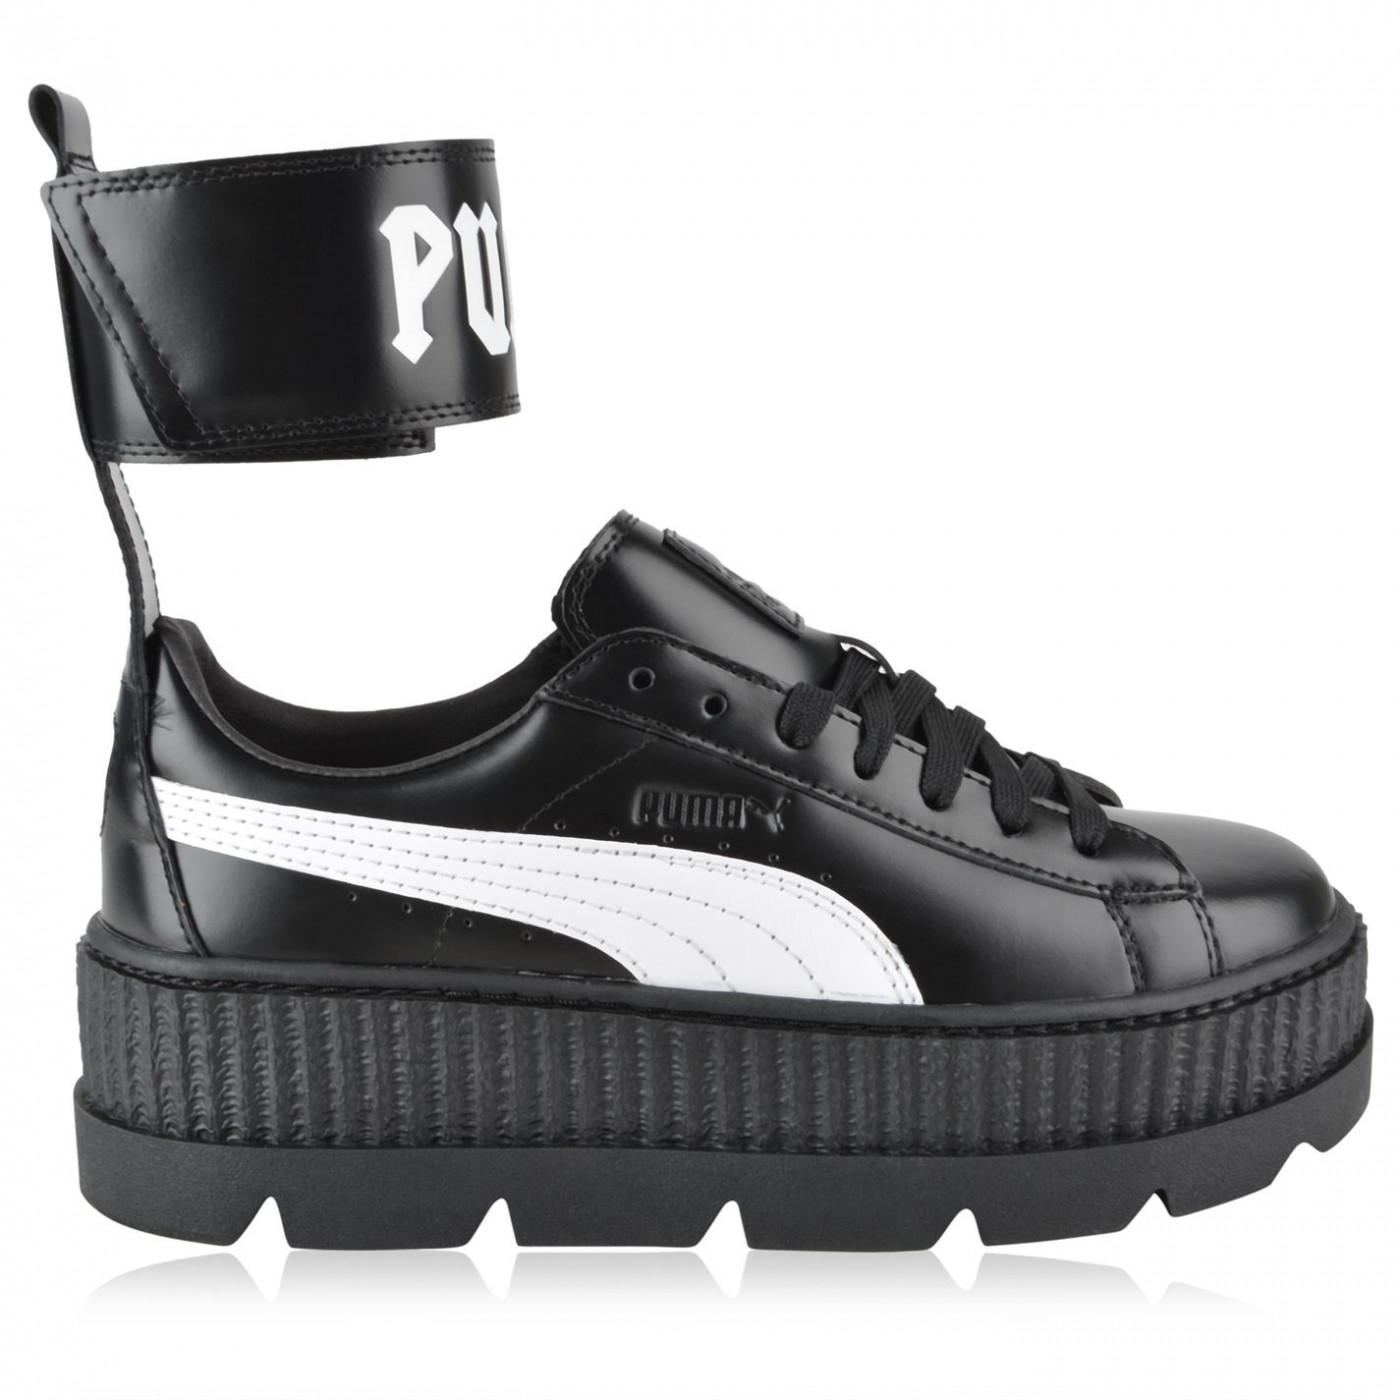 new product 8f69c 7b576 FENTY PUMA by Rihanna Strap Trainers - FACTCOOL